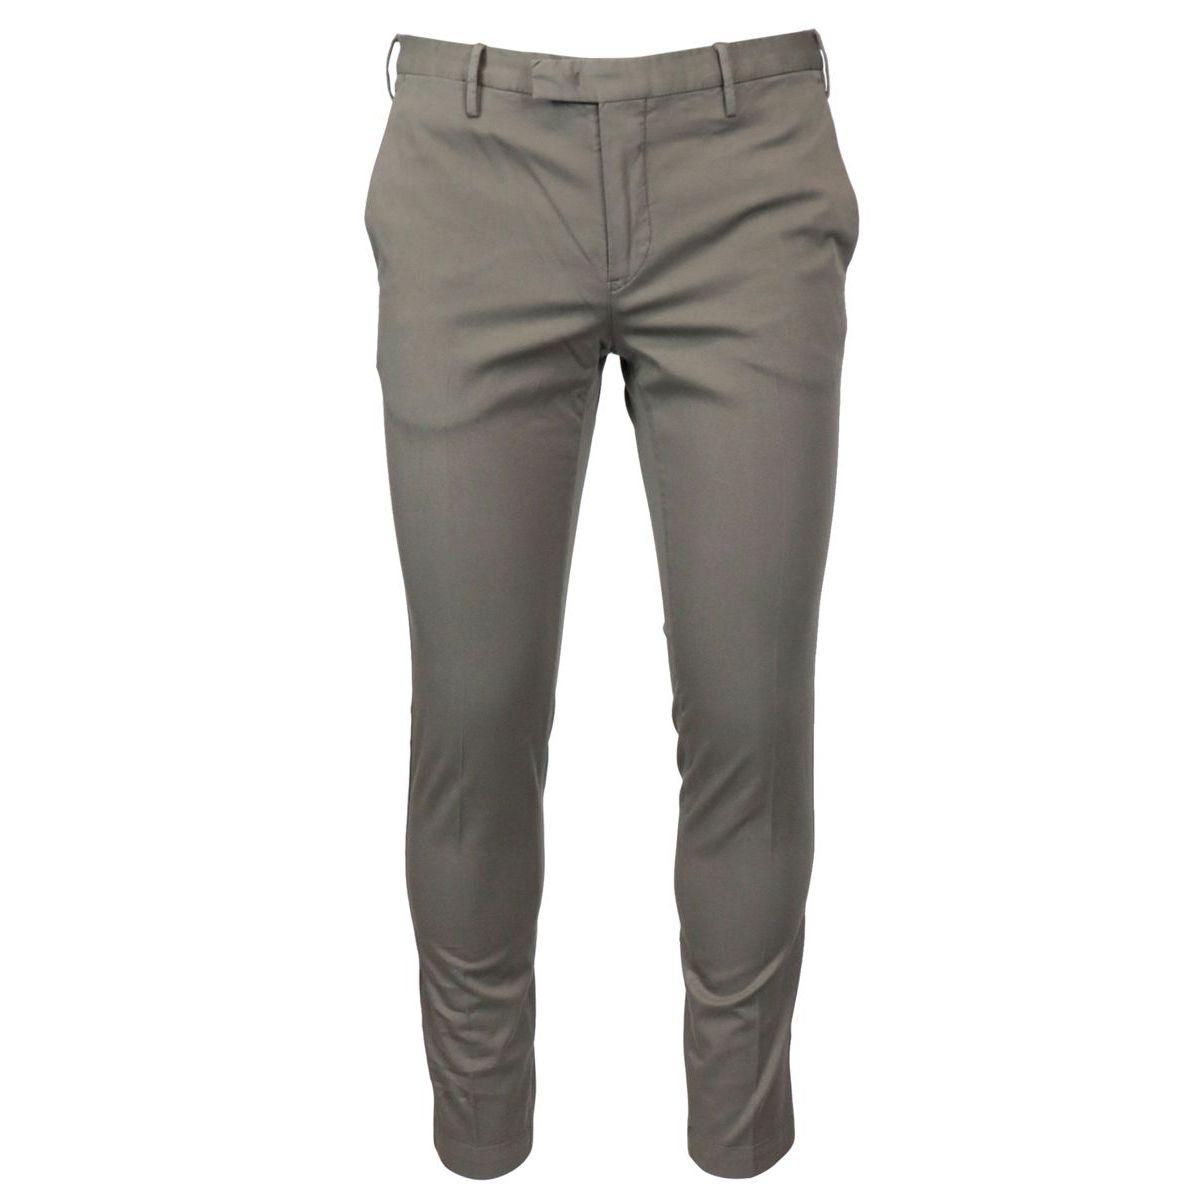 Cotton skinny fit trousers Tortora PT TORINO